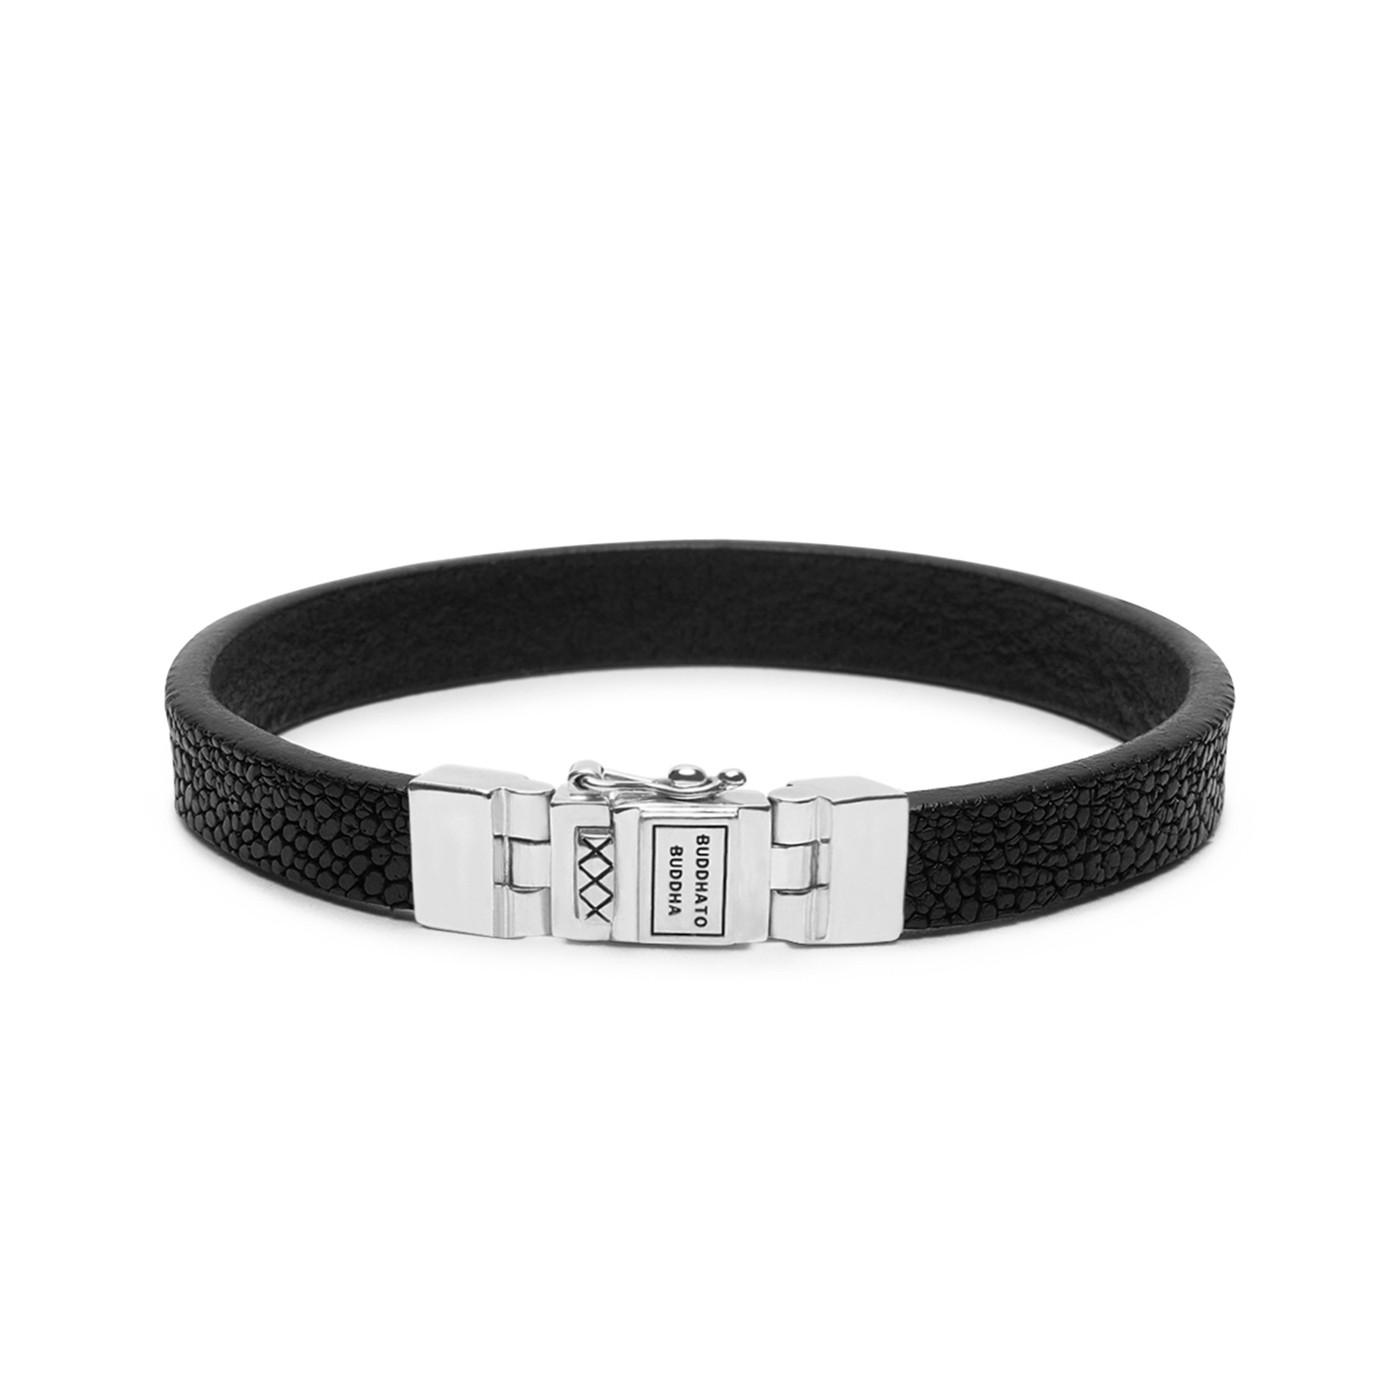 Buddha to Buddha Essential Leather Texture Black Armband 186BL (Lengte: 18.00-23.00 cm)